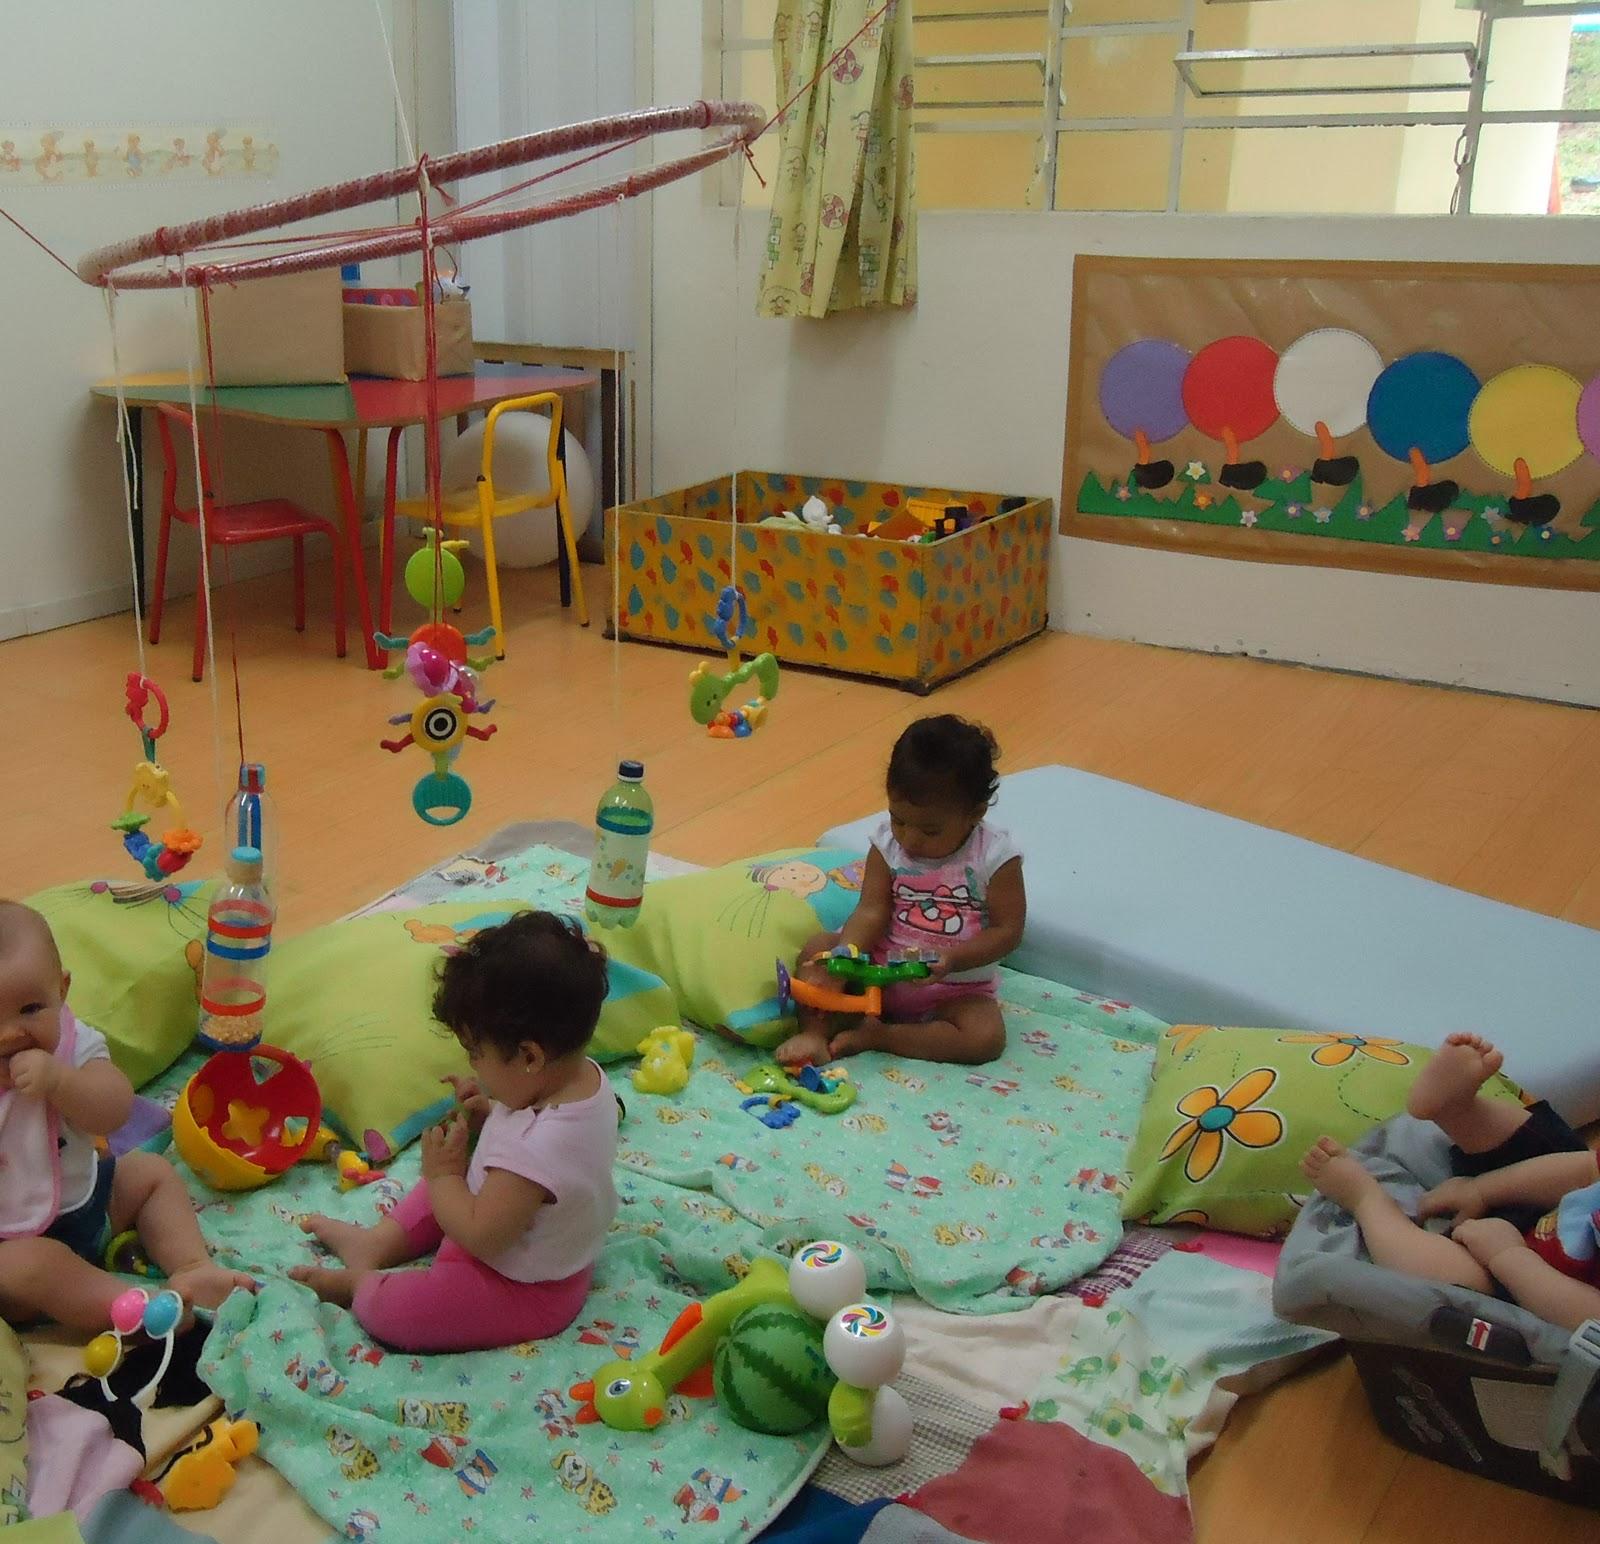 centro de educa o infantil prof tereza a e augsburger m bile ber rio. Black Bedroom Furniture Sets. Home Design Ideas